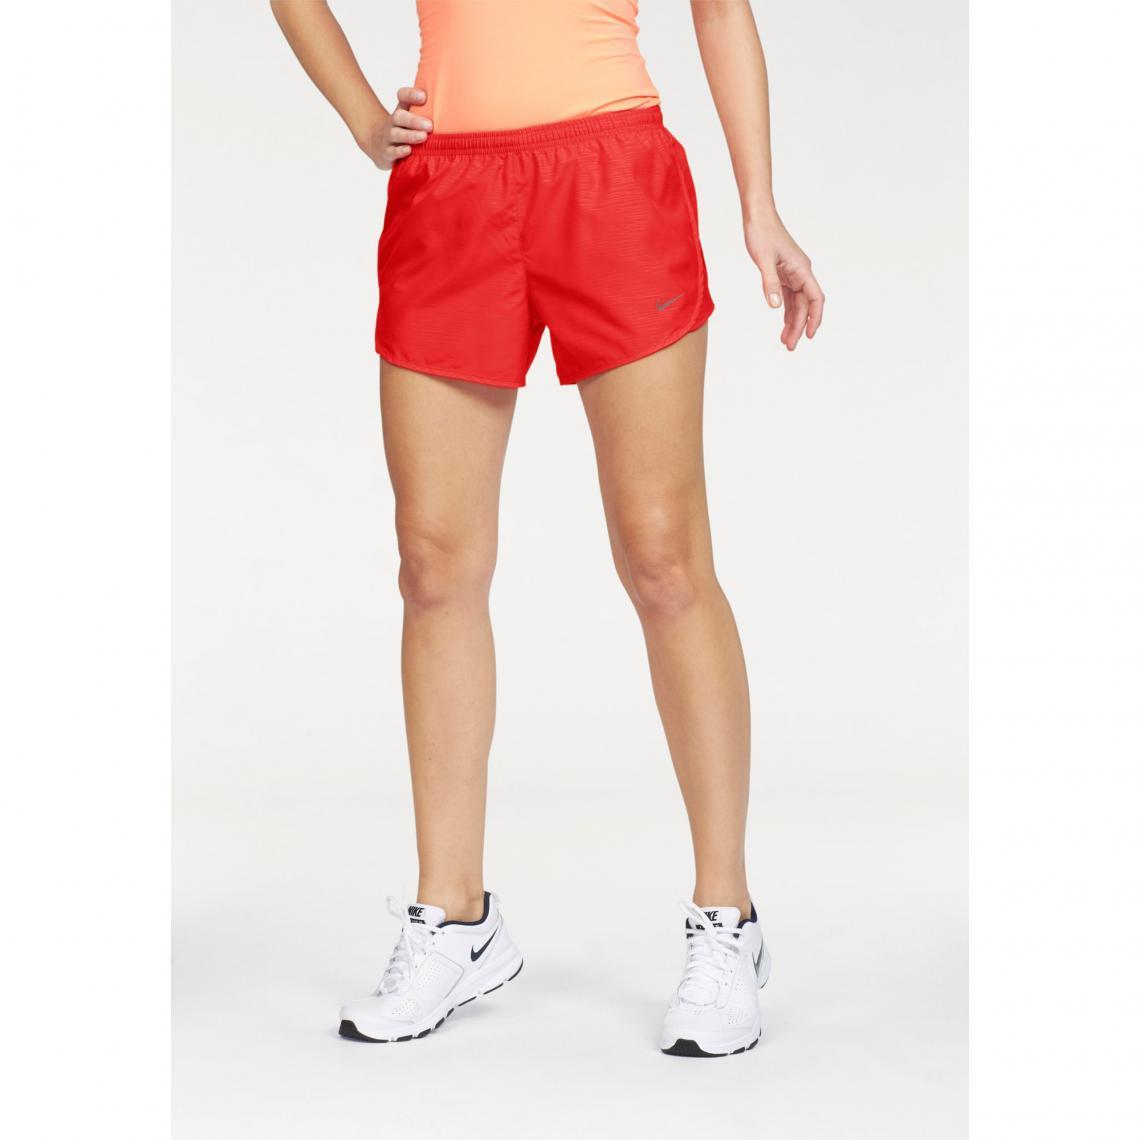 best loved 91fc1 0e0f7 Short court femme Nike Modern Embossed Tempo de Nike - Rouge | 3 SUISSES